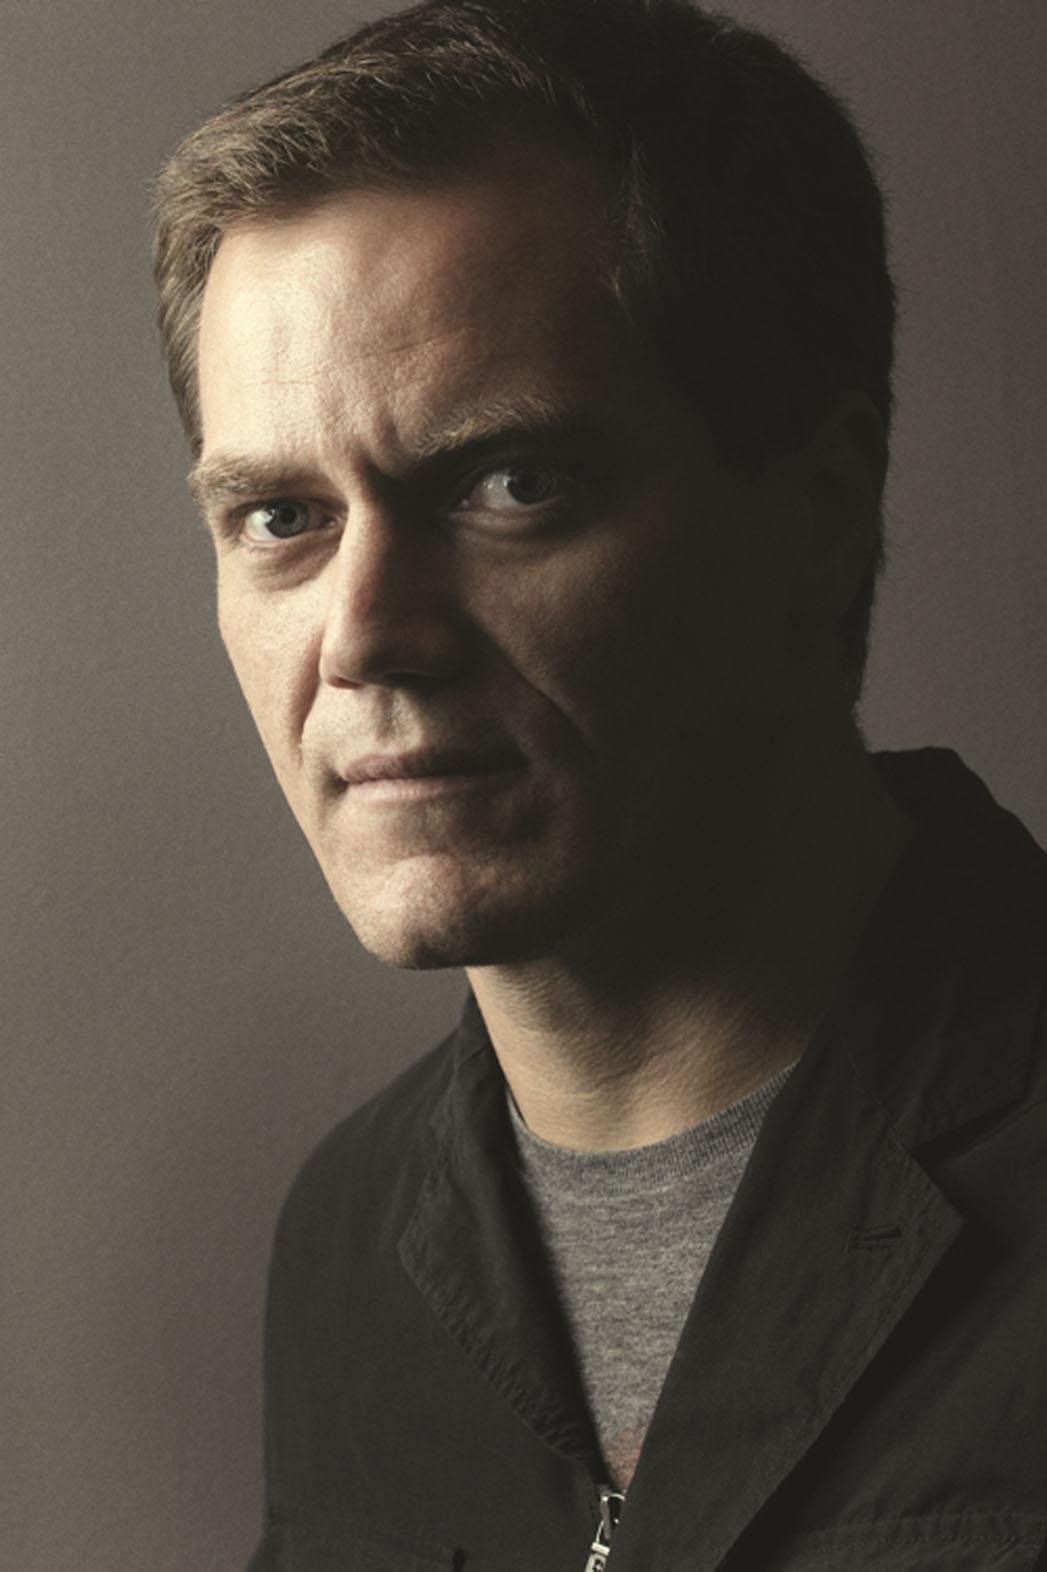 Michael Shannon Headshot - P 2013